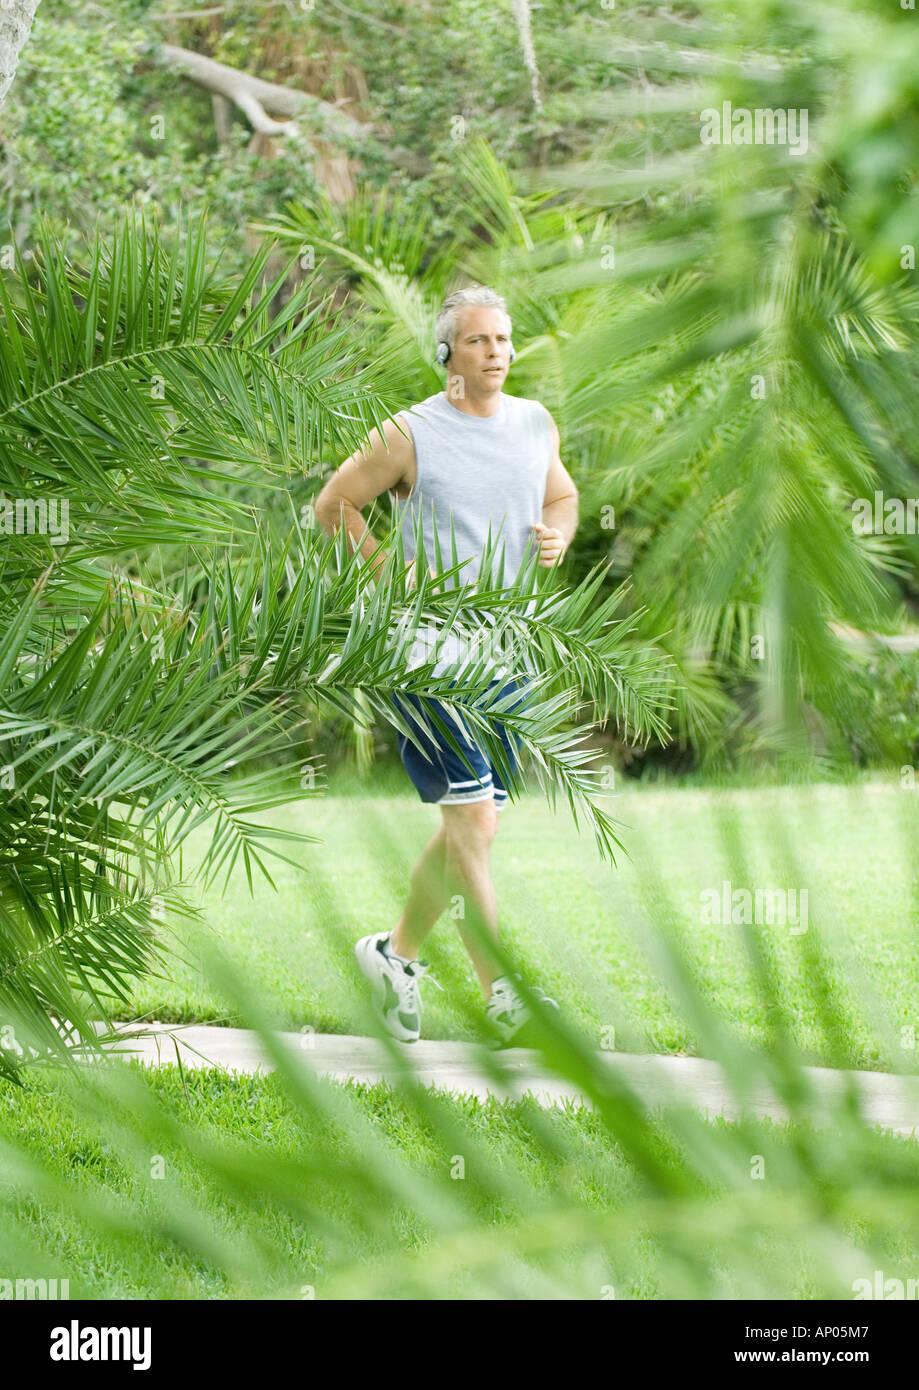 Mature man jogging on walkway - Stock Image